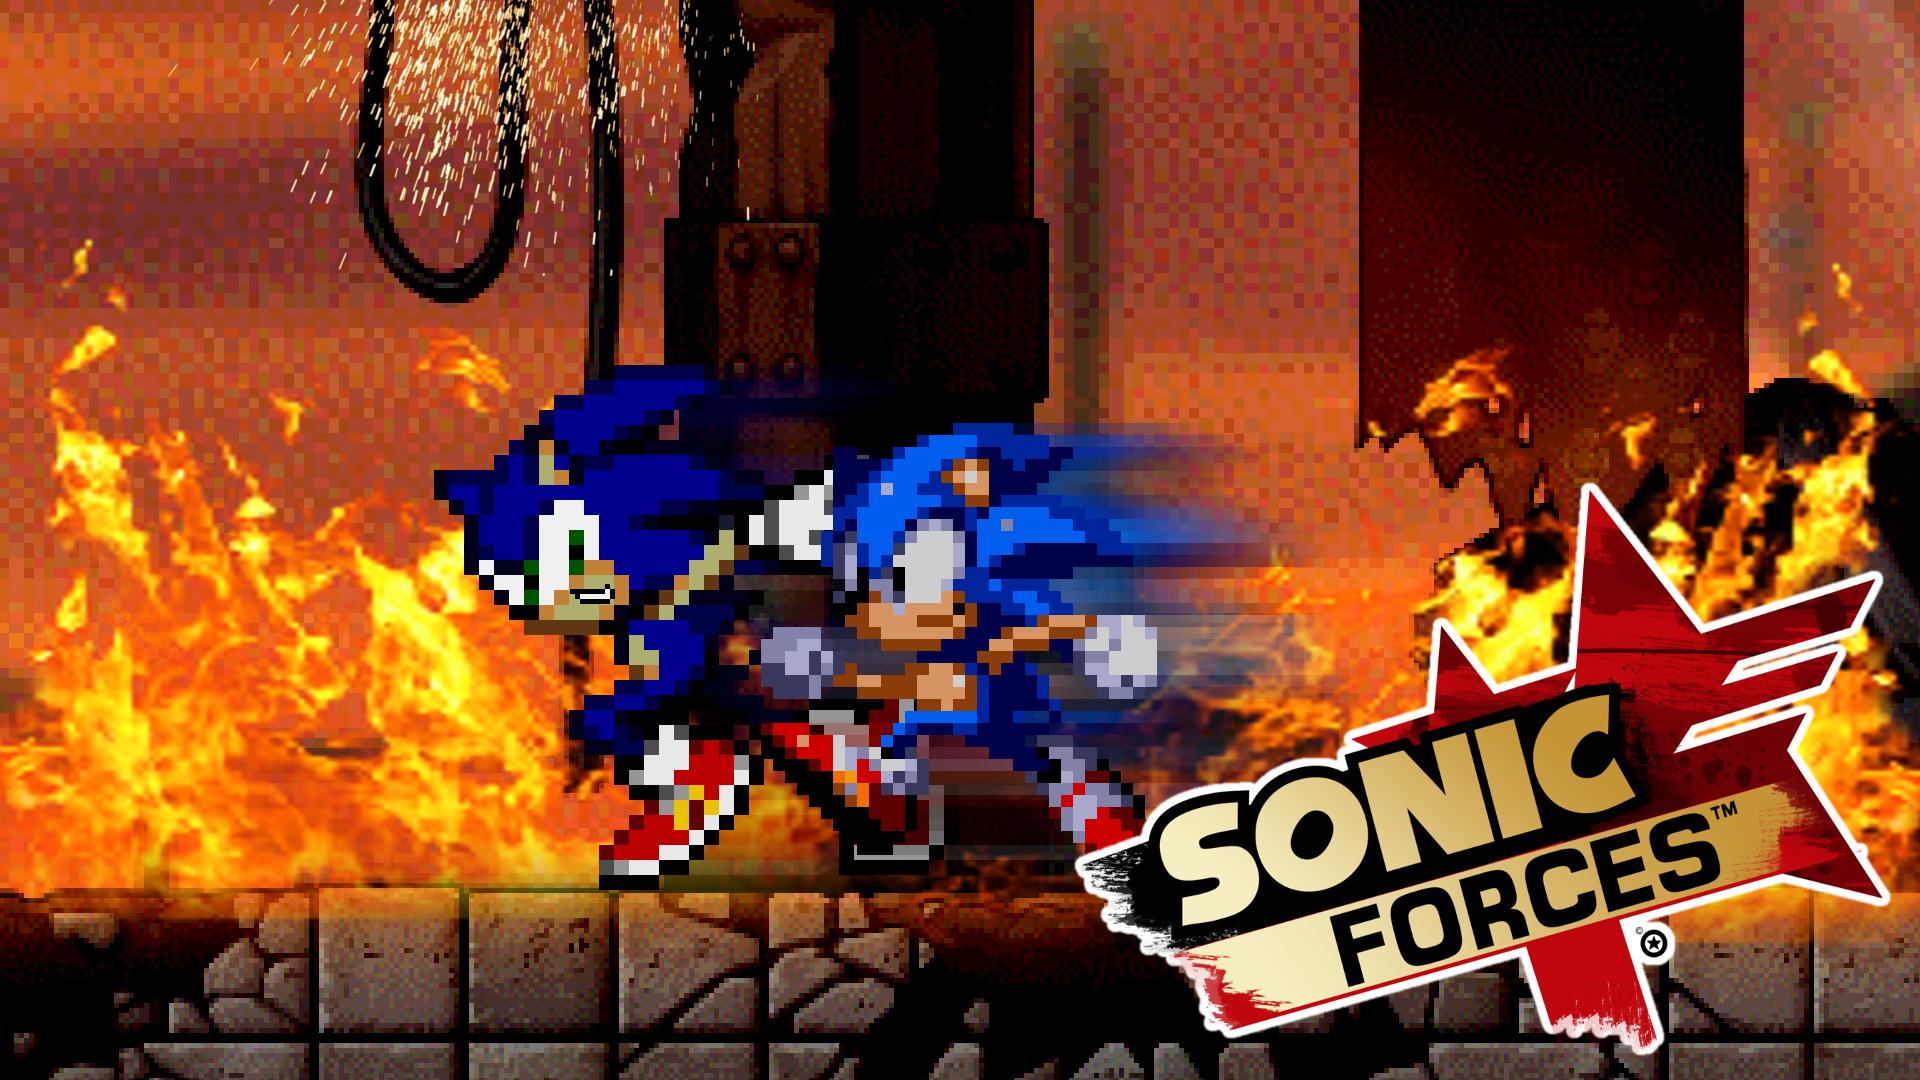 Sonic Forces Fan Art Wallpaper By MattPlaysVG On DeviantArt